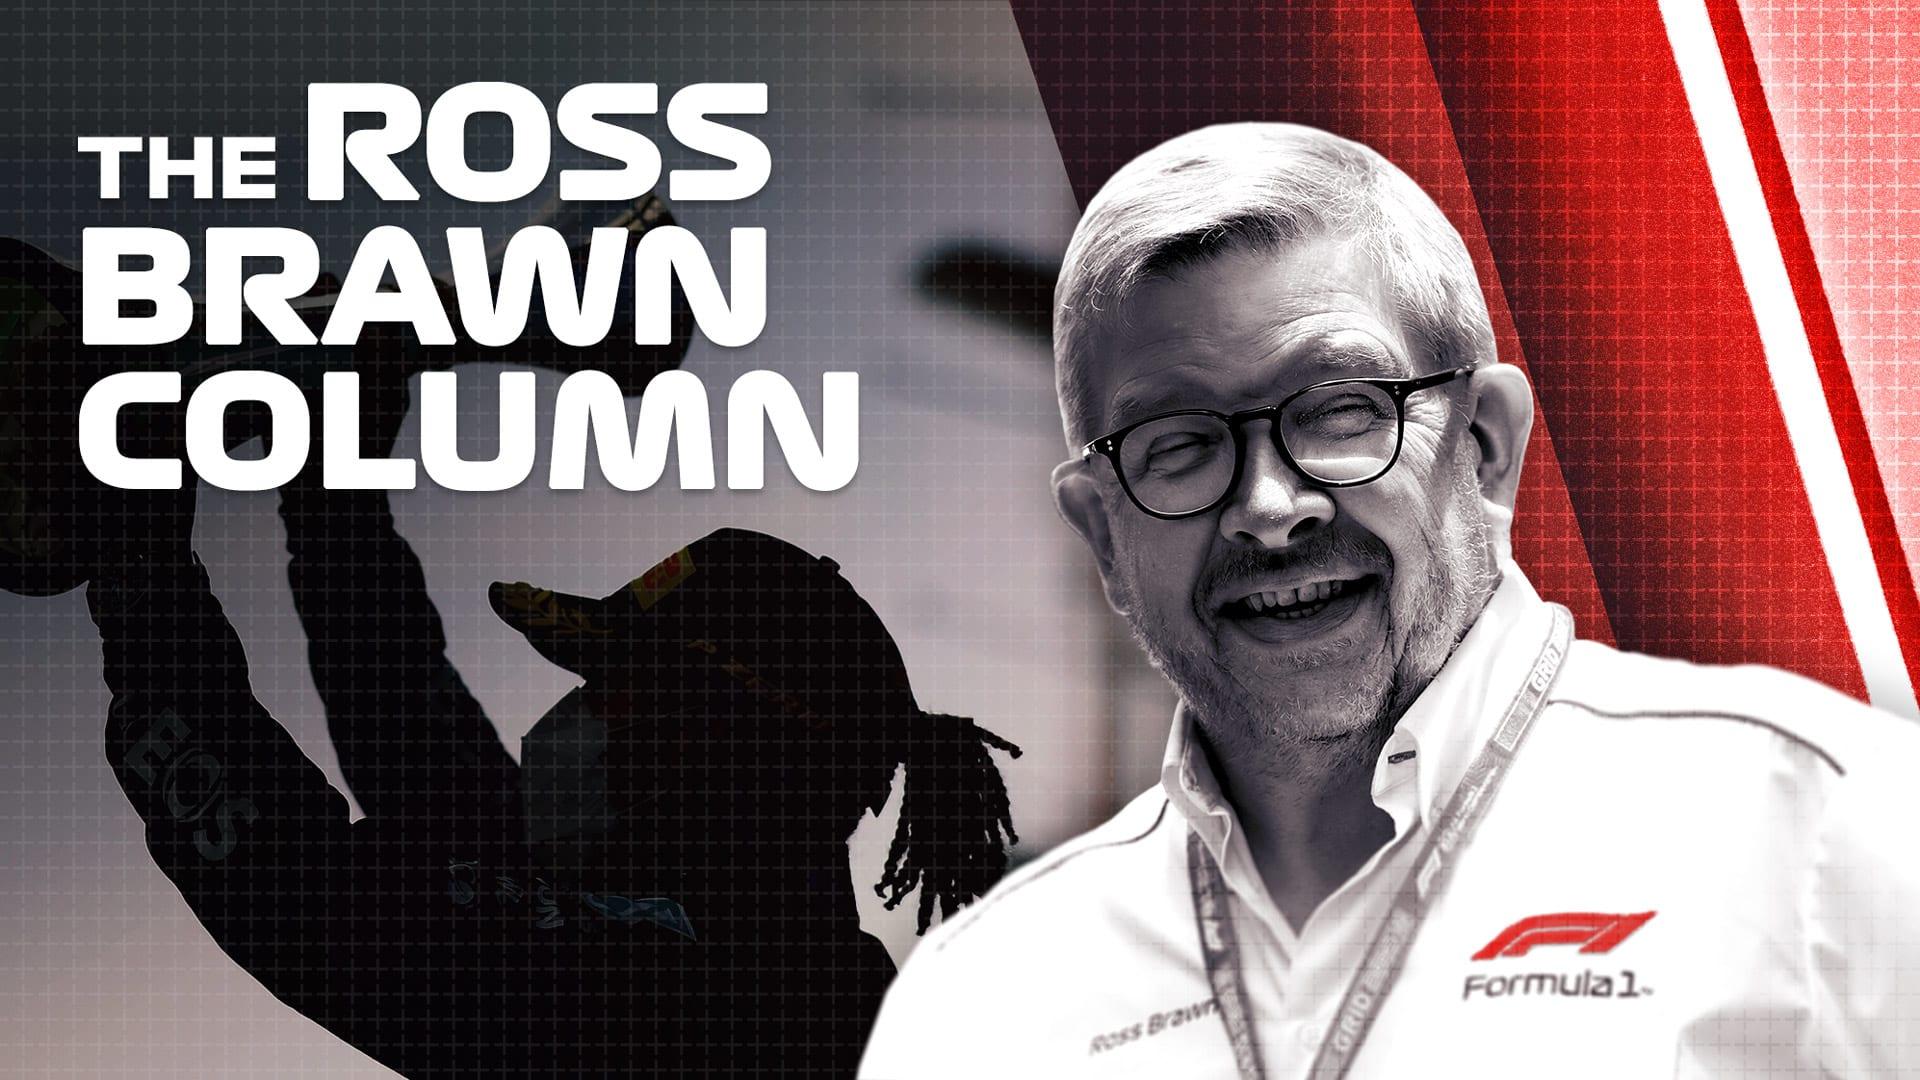 The Ross Brawn Column – On Hamilton's historic weekend, Ferrari's turnaround, and finding his feet at McLaren | Formula 1®